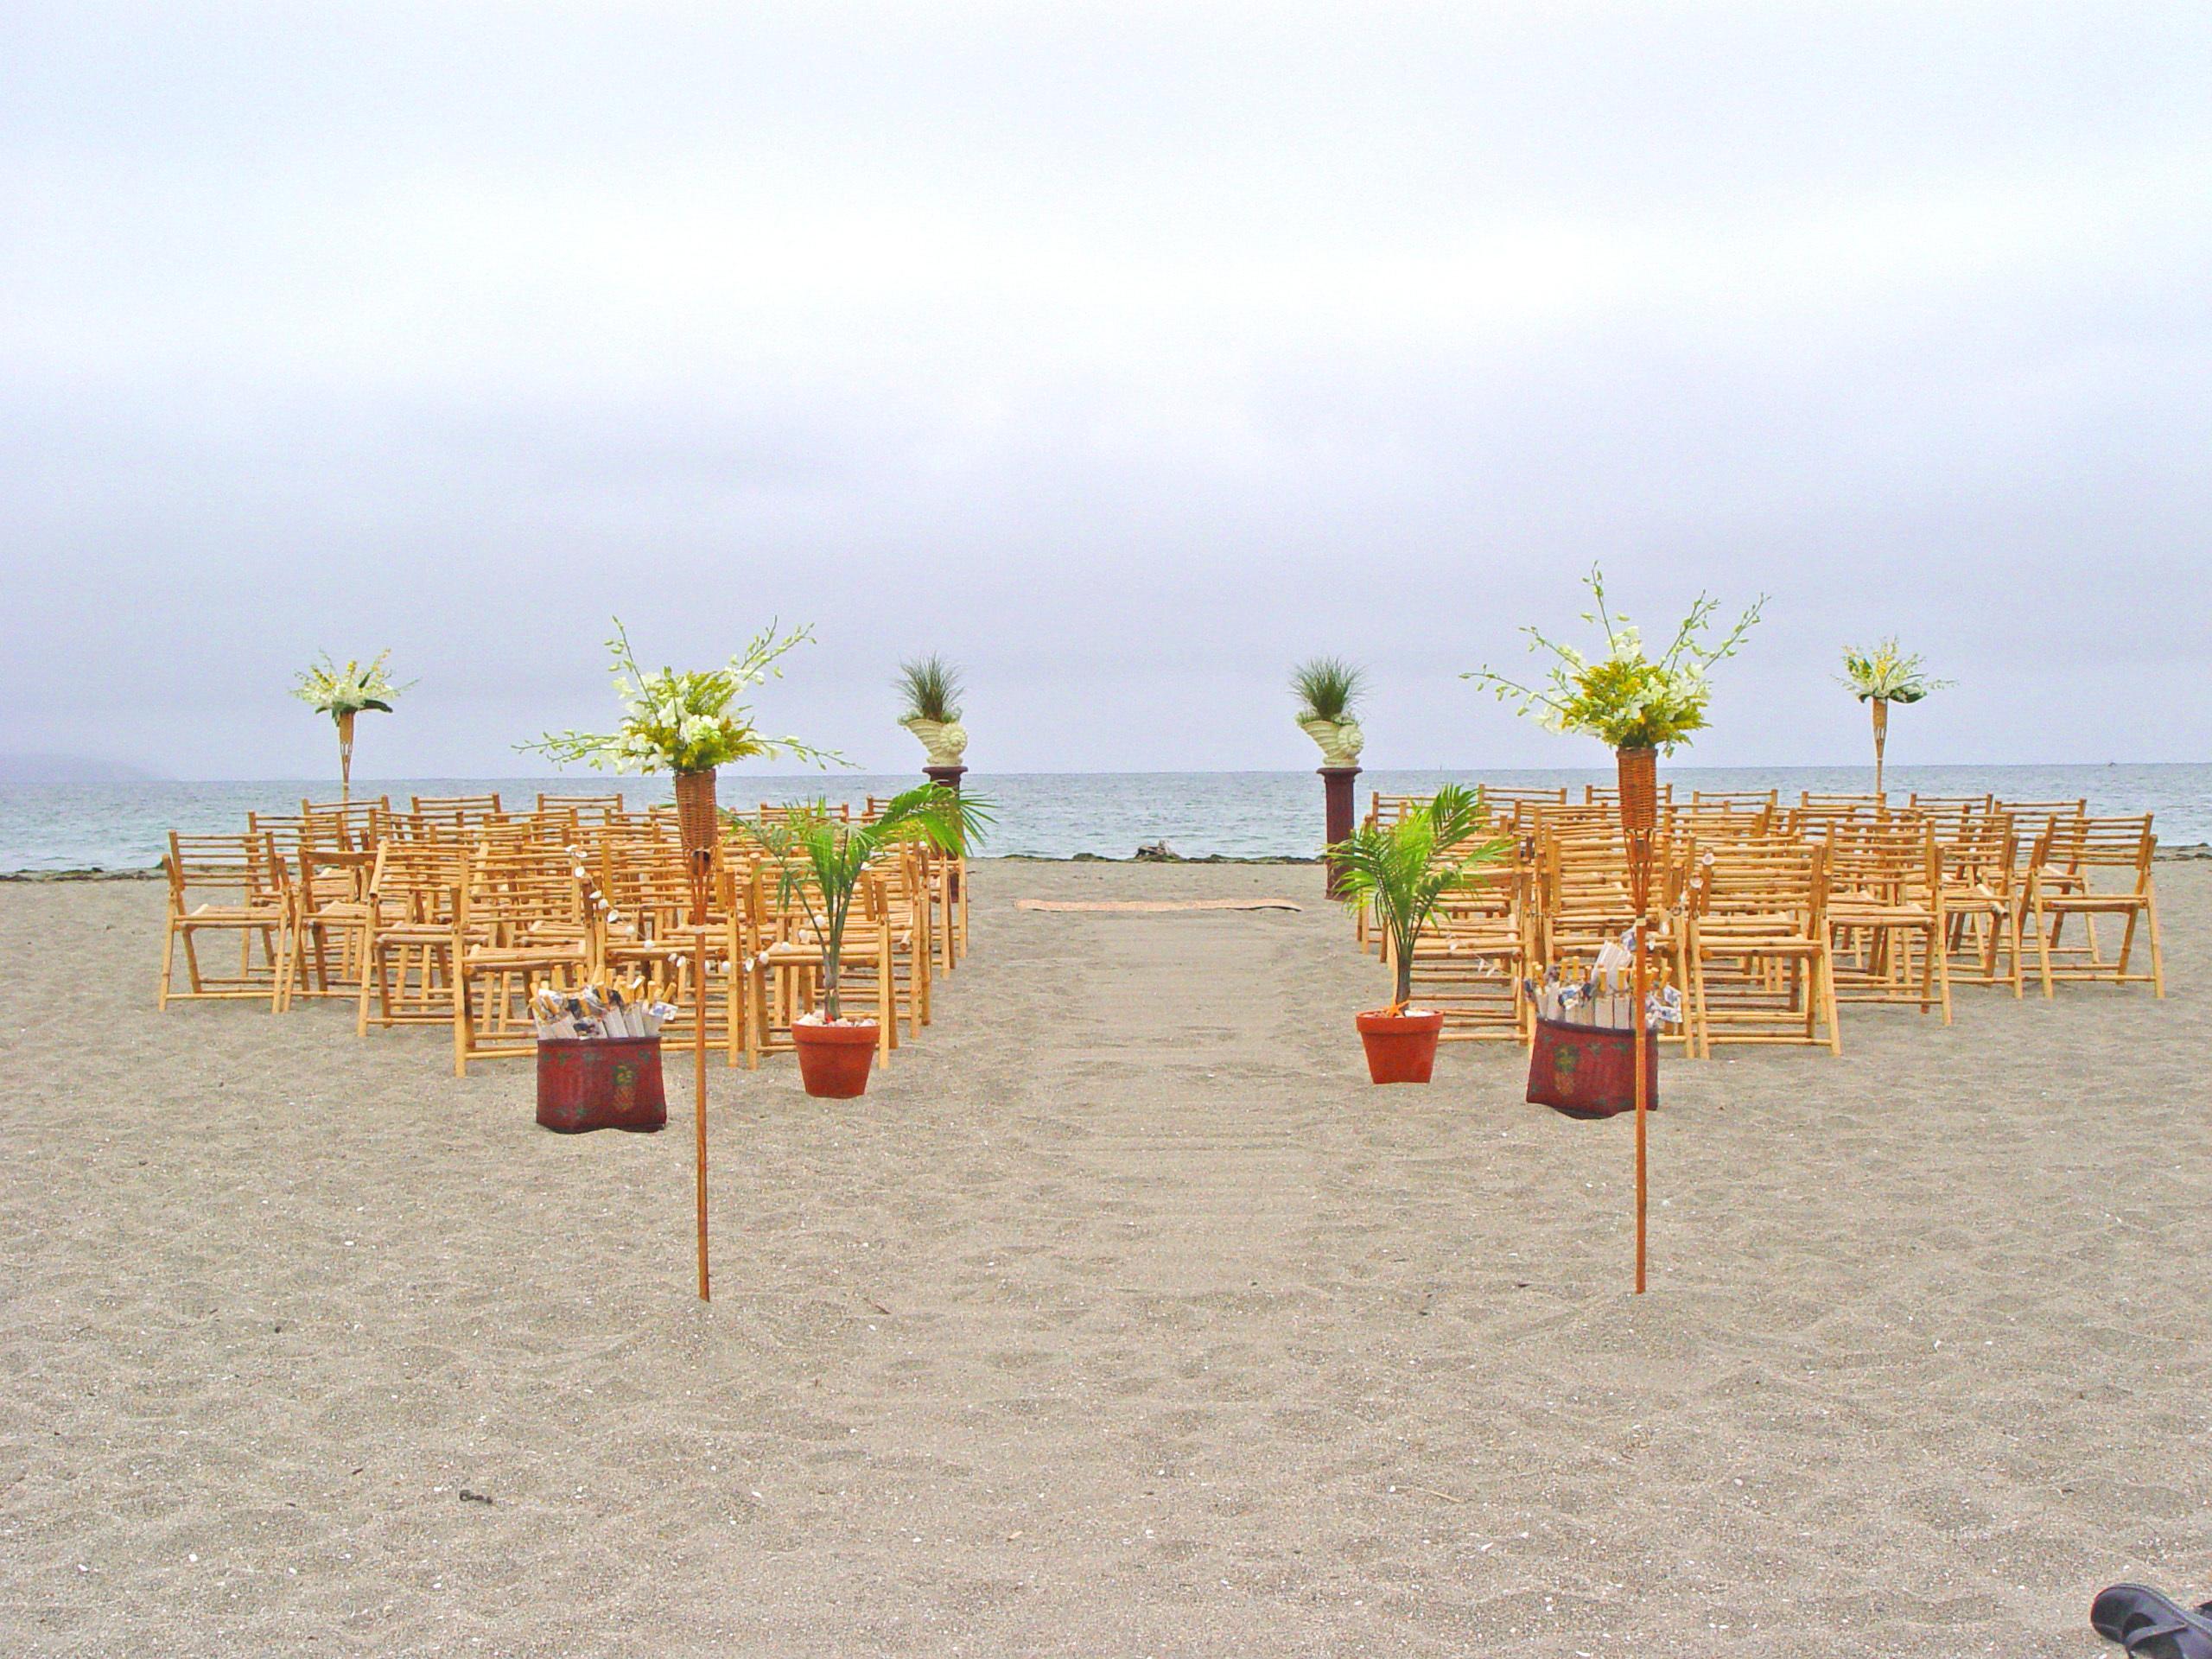 Ceremony, Flowers & Decor, Beach, Ceremony Flowers, Flowers, Beach Wedding Flowers & Decor, Wedding, Tropical, At, Bodega